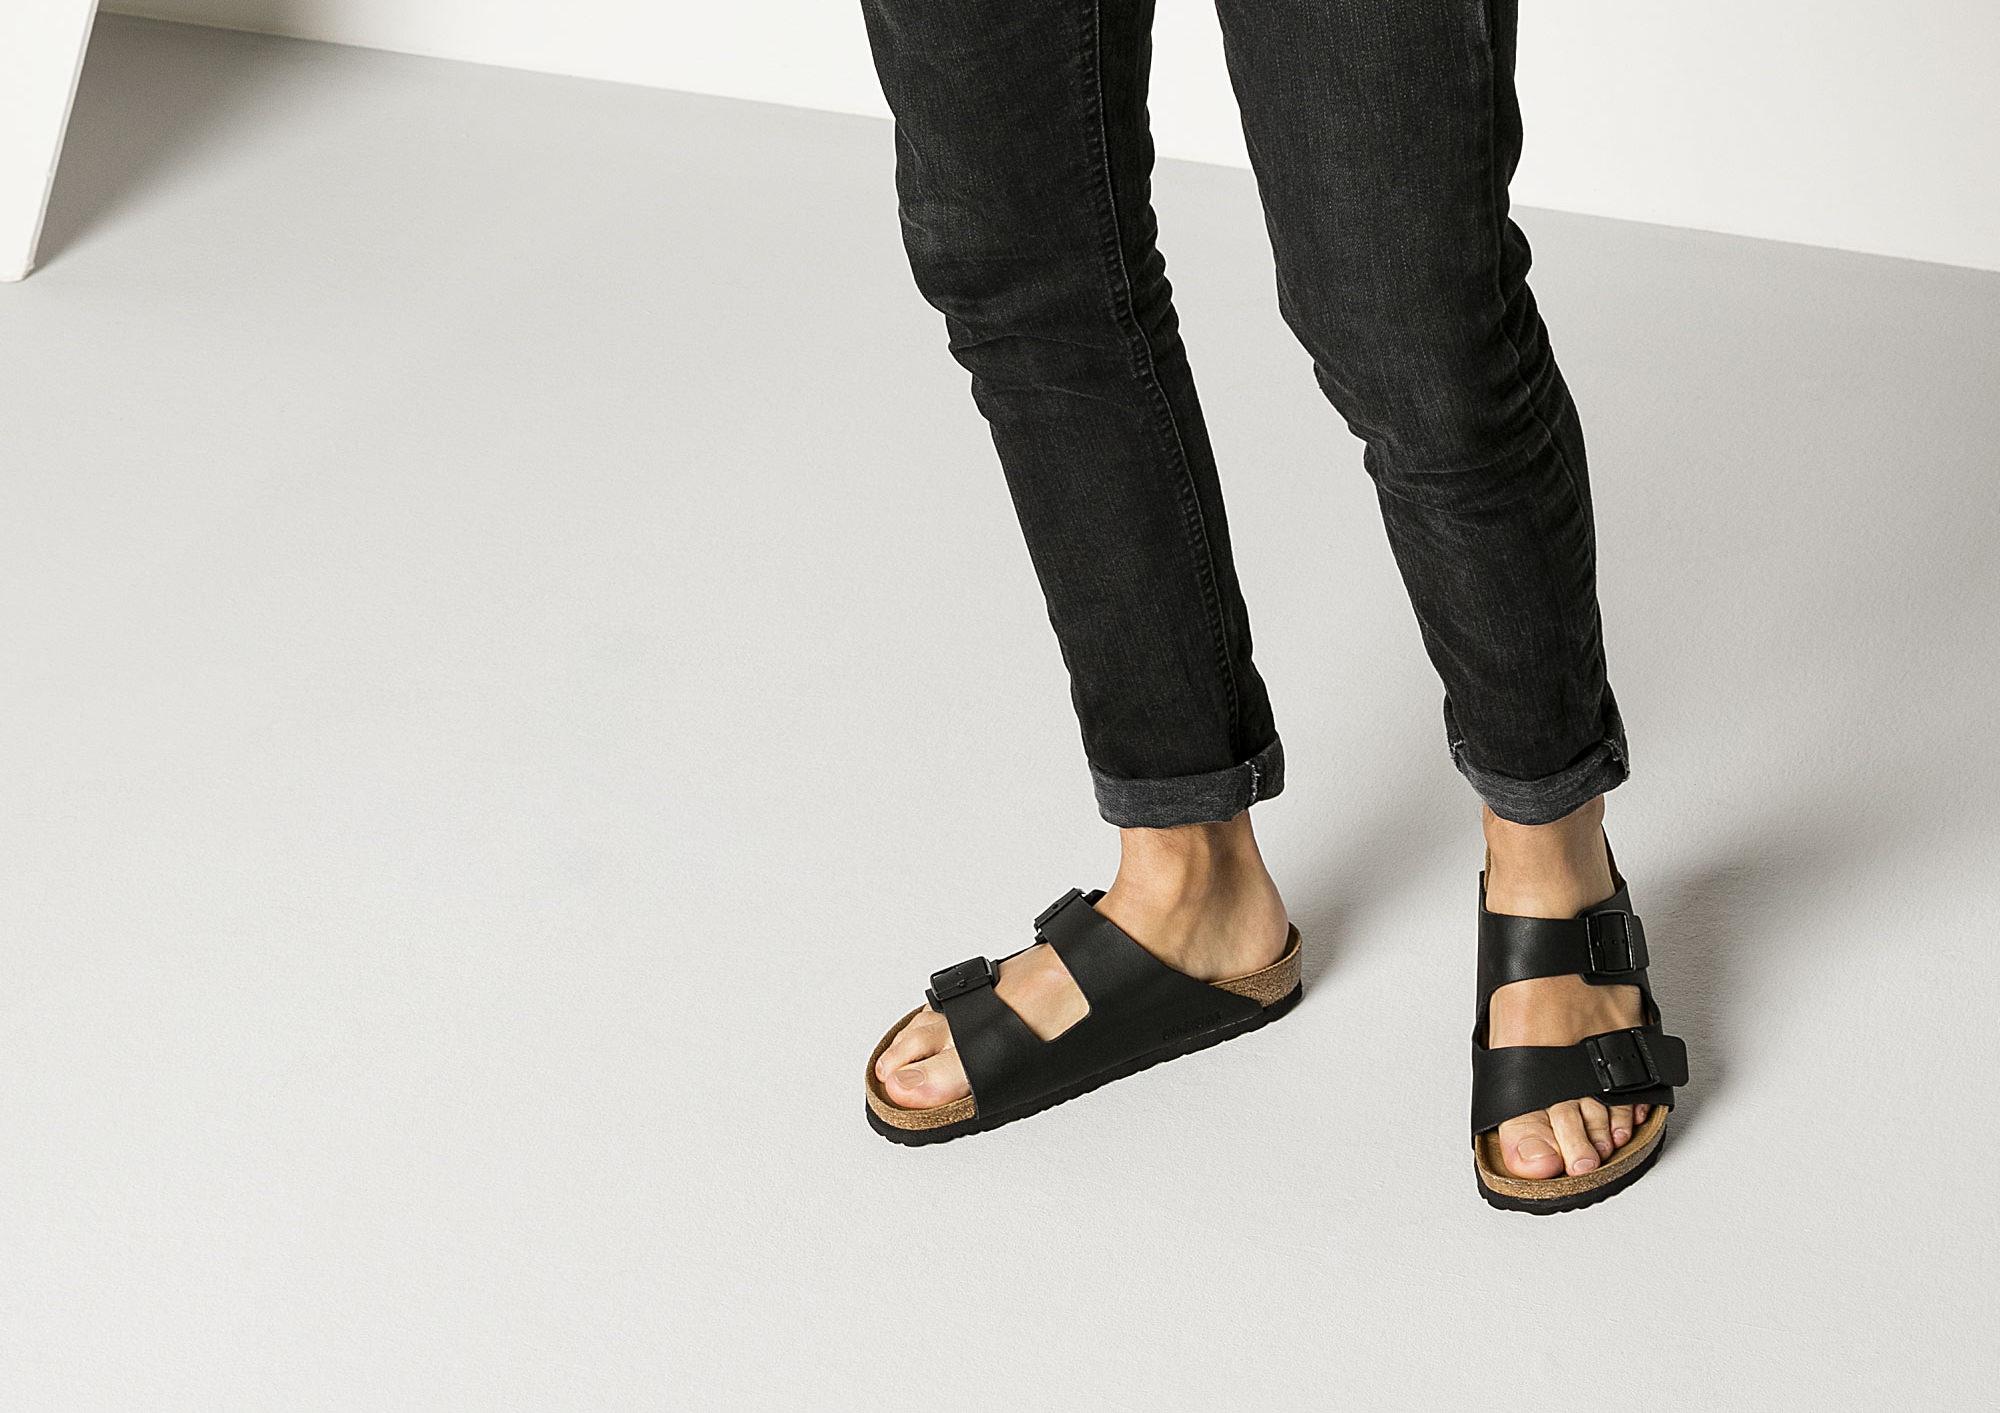 chaussure ete homme